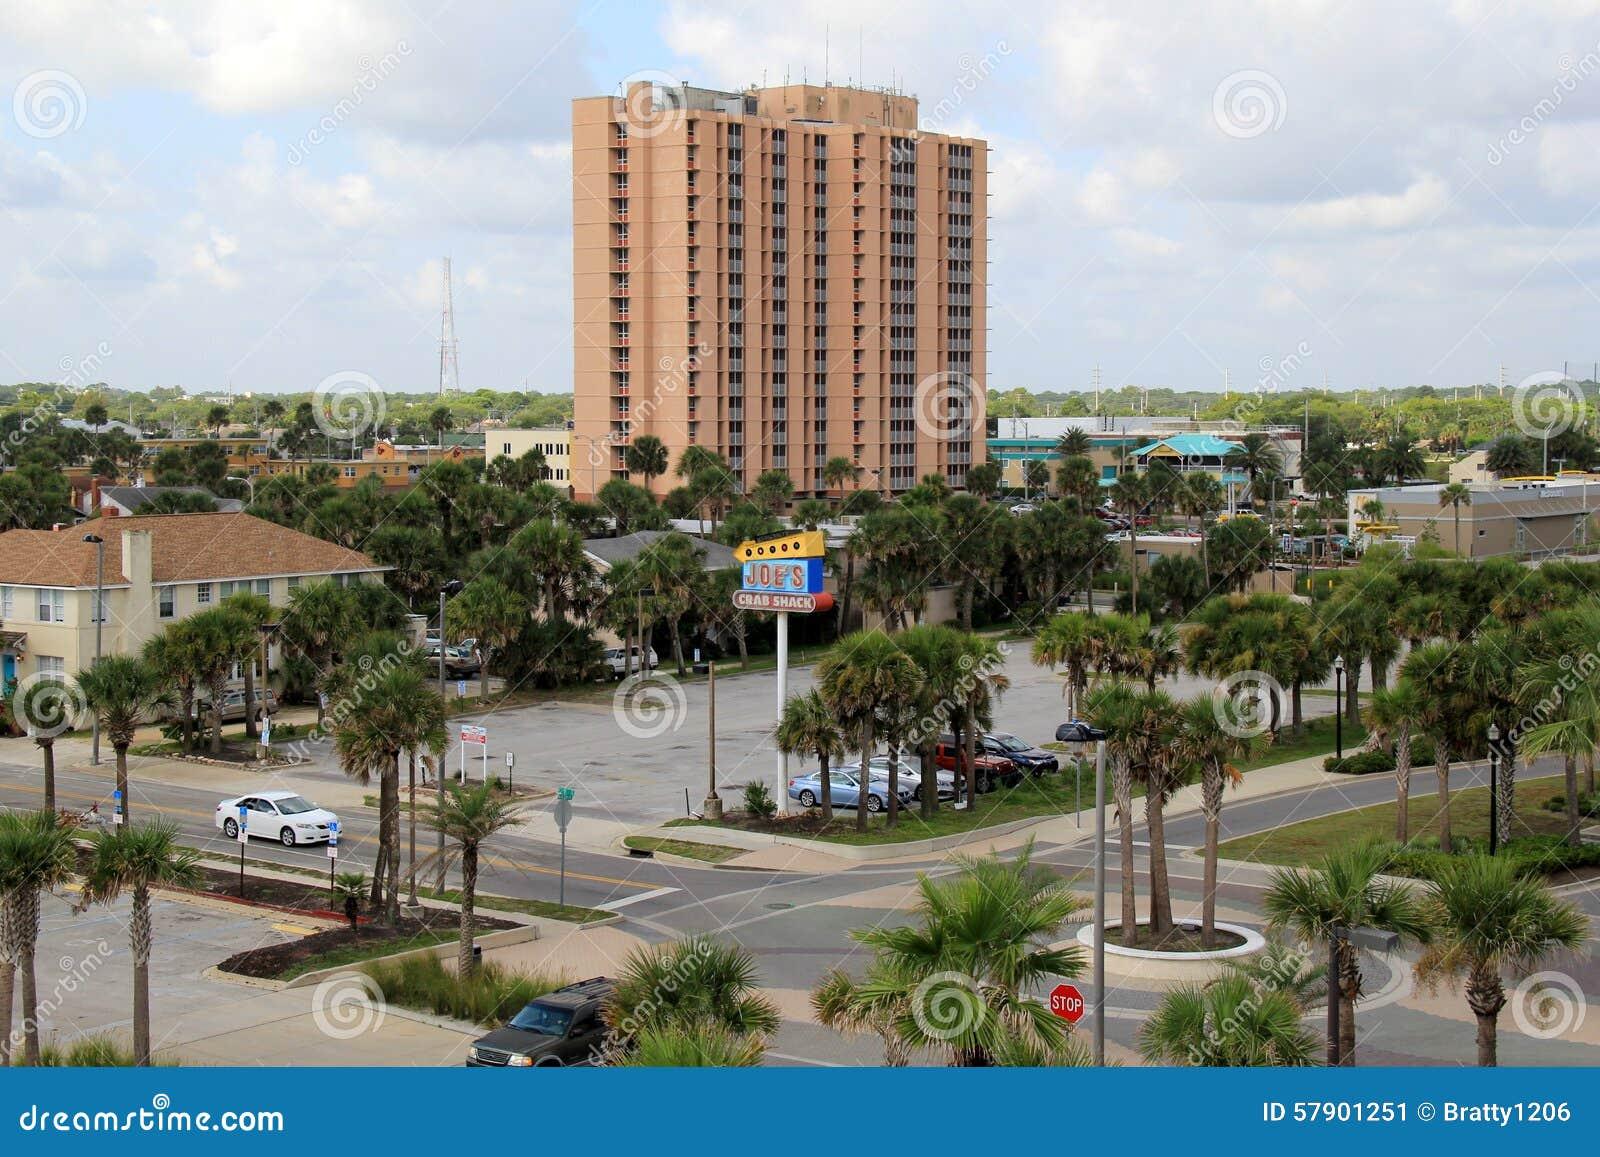 City view, Jacksonville Beach, Florida,2015